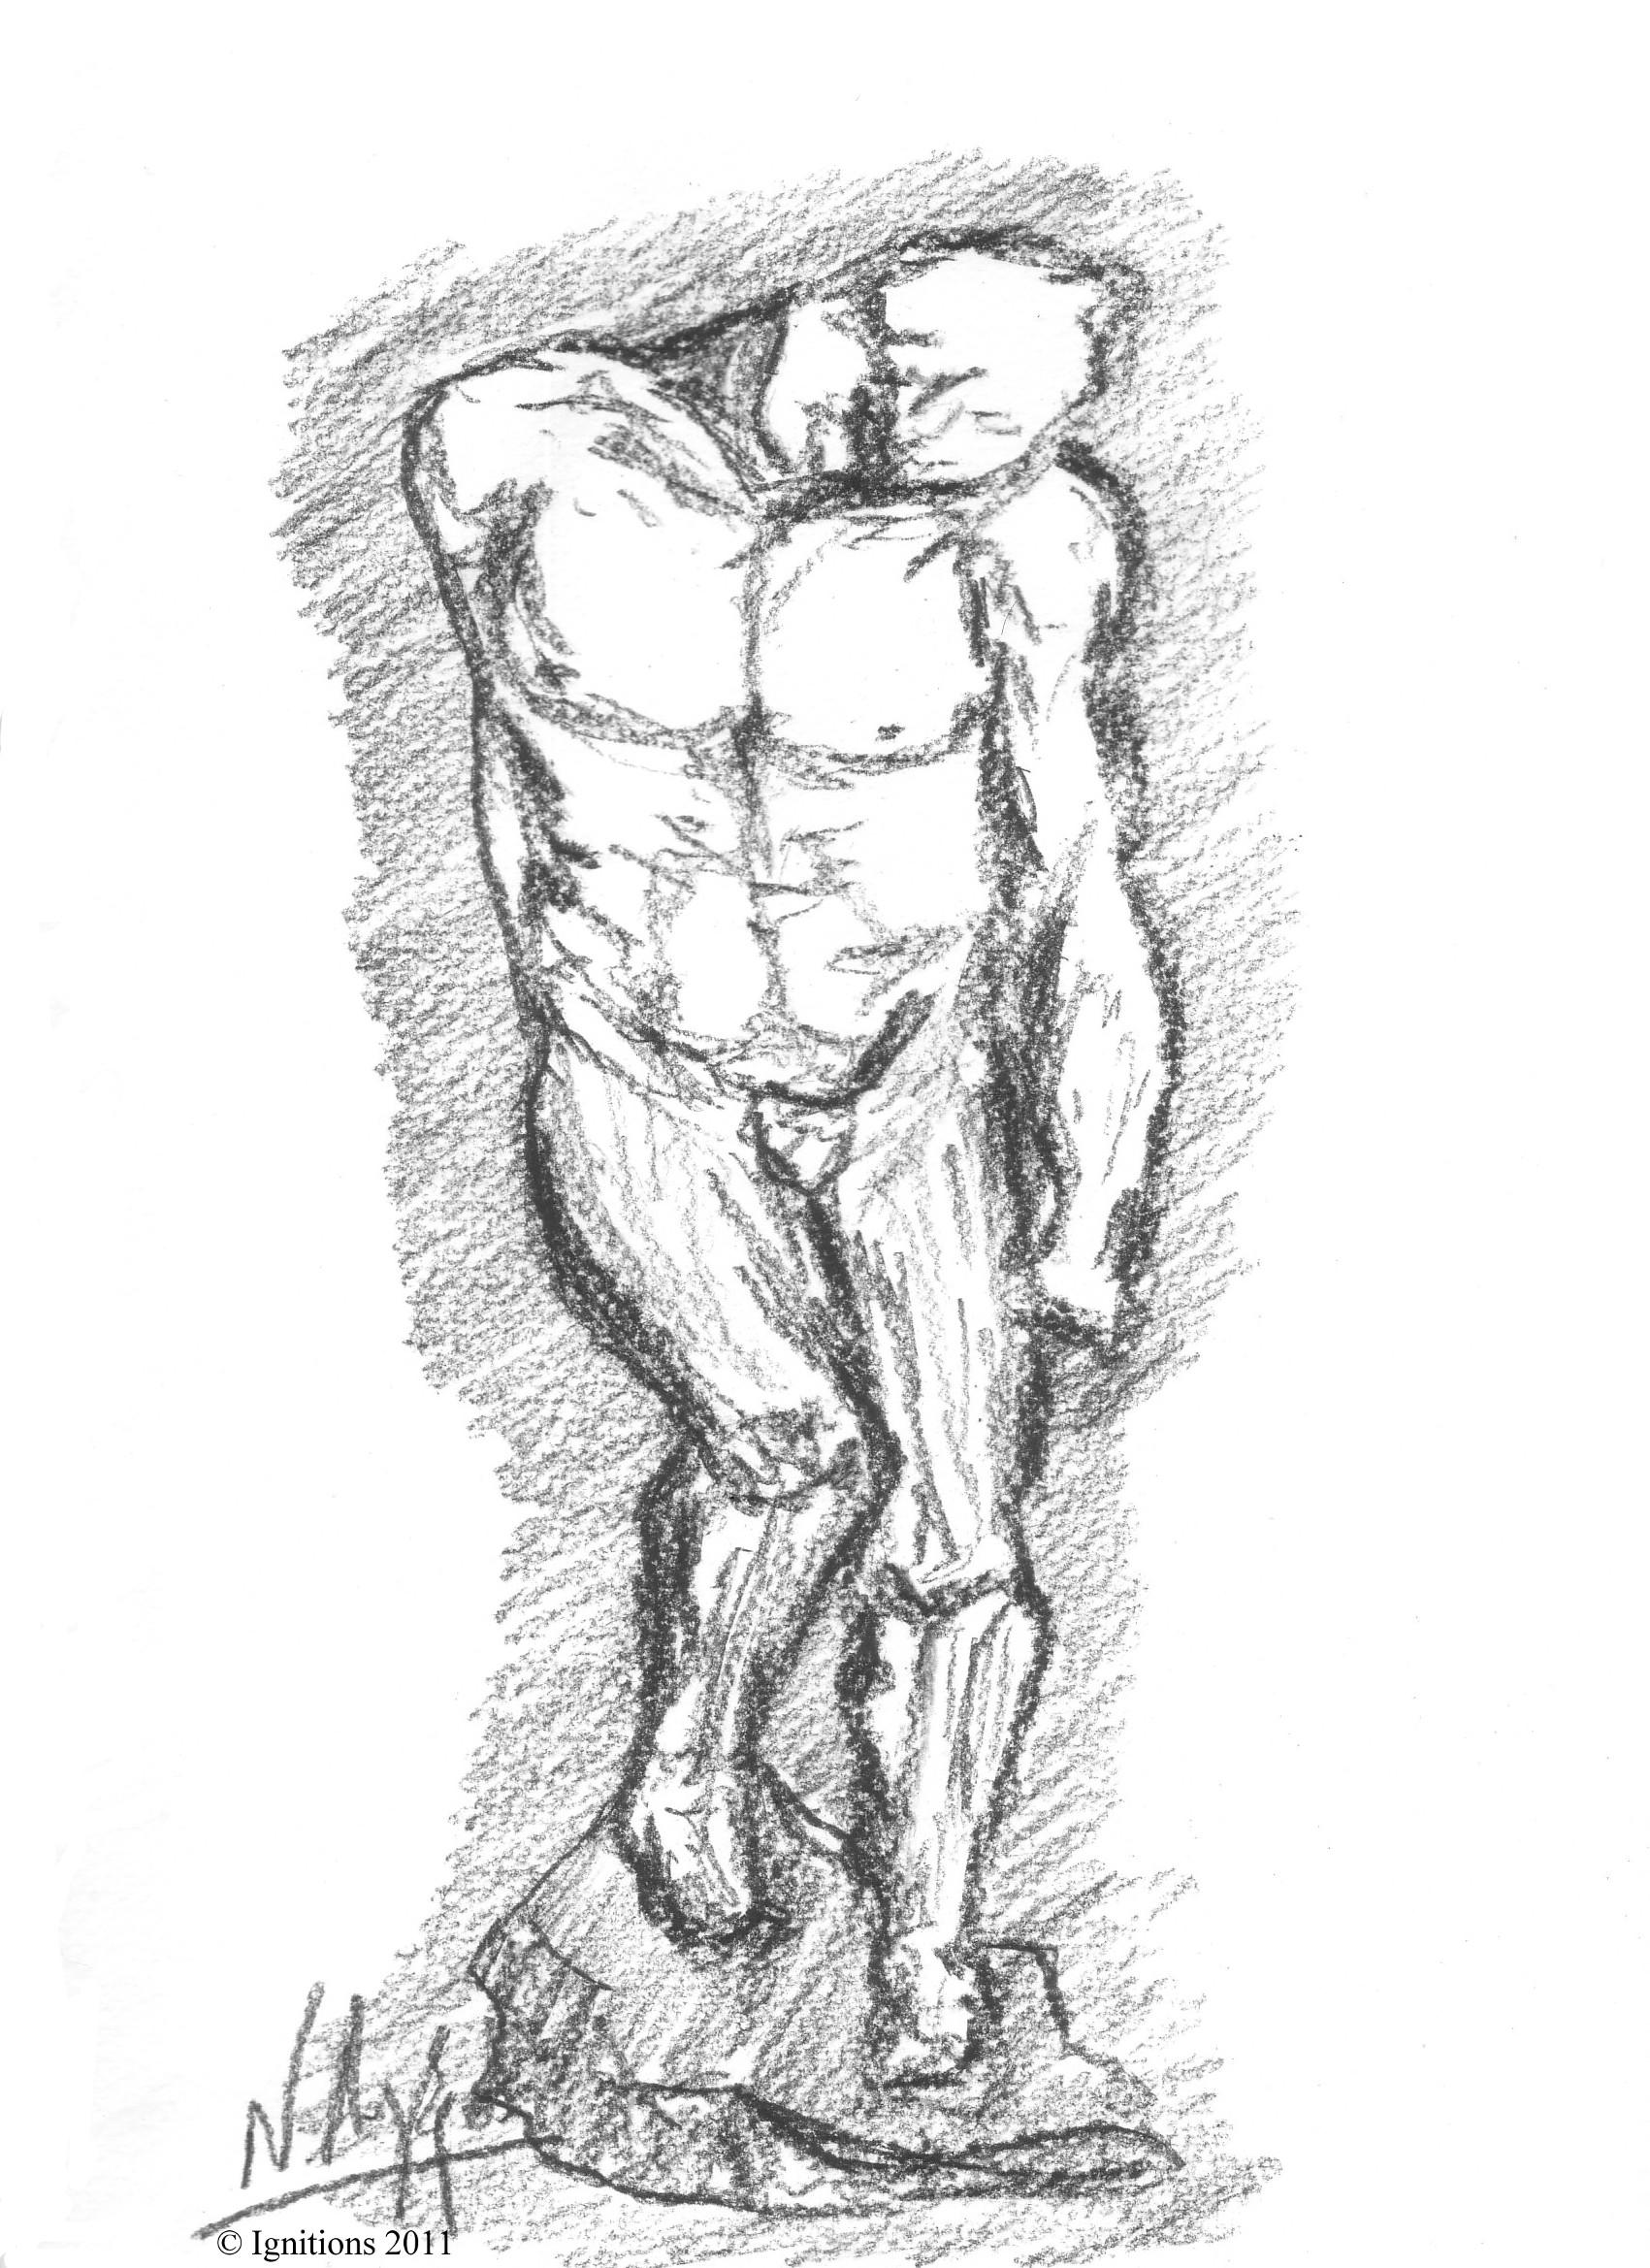 Hommage à Rodin.